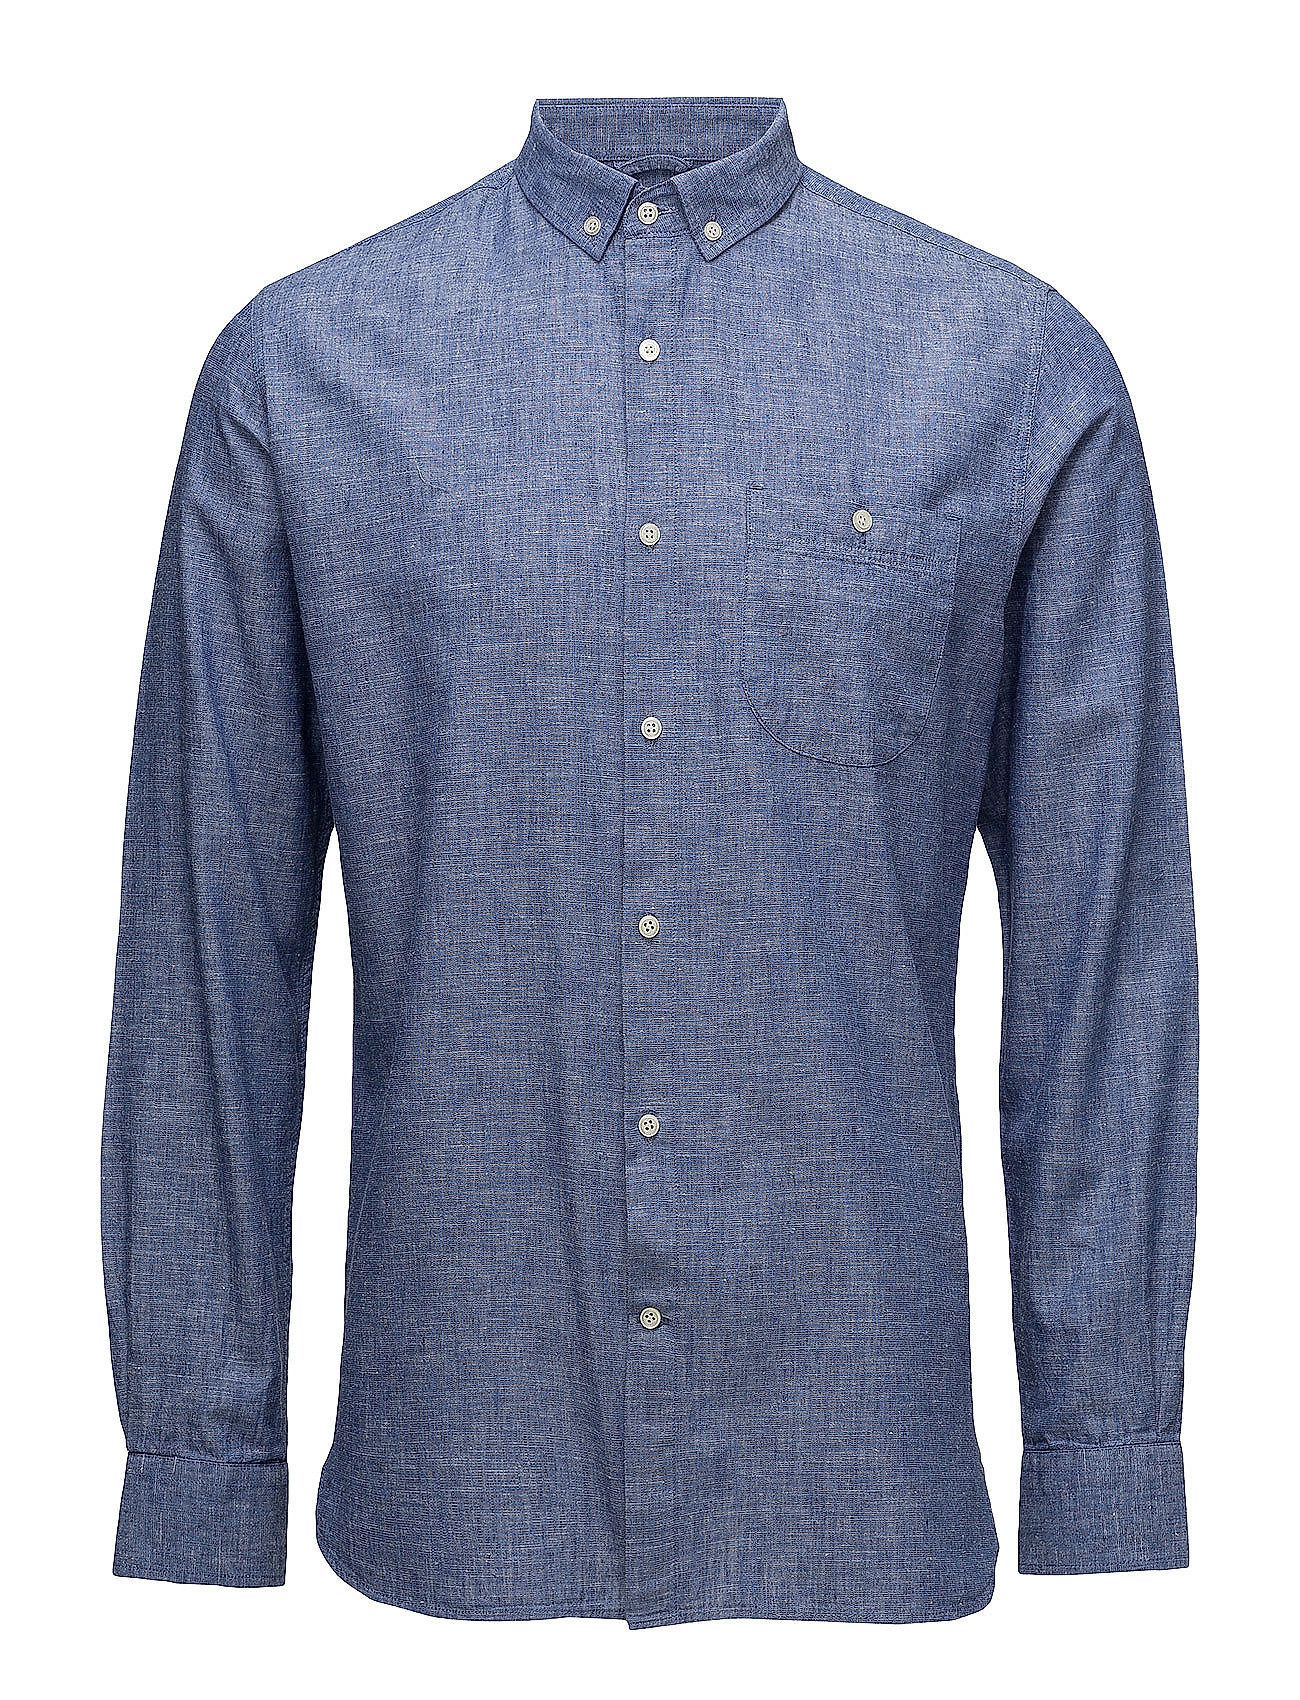 cotton linen shirt gots strong blue knowledge cotton apparel. Black Bedroom Furniture Sets. Home Design Ideas